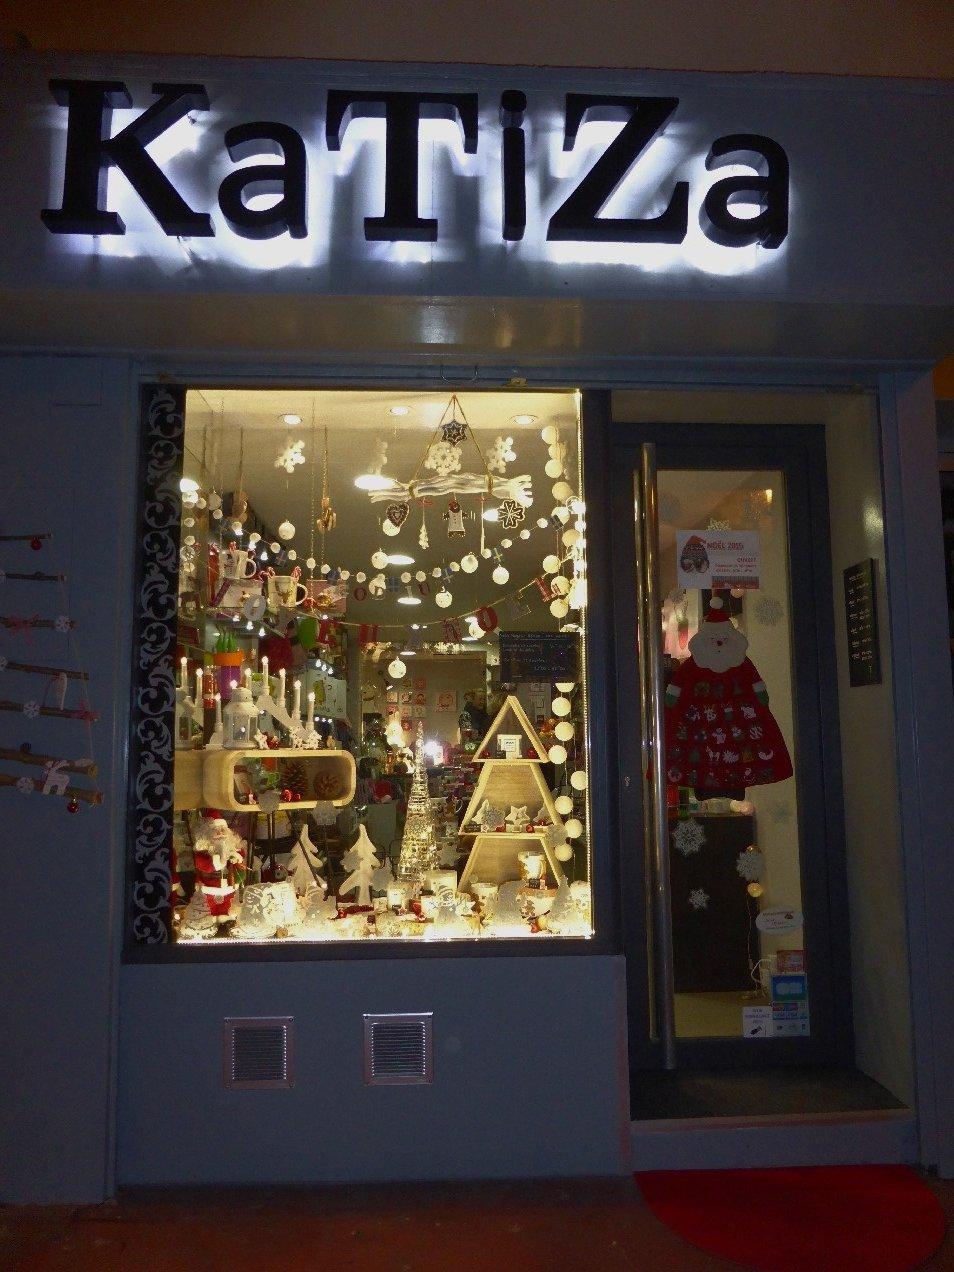 Katiza